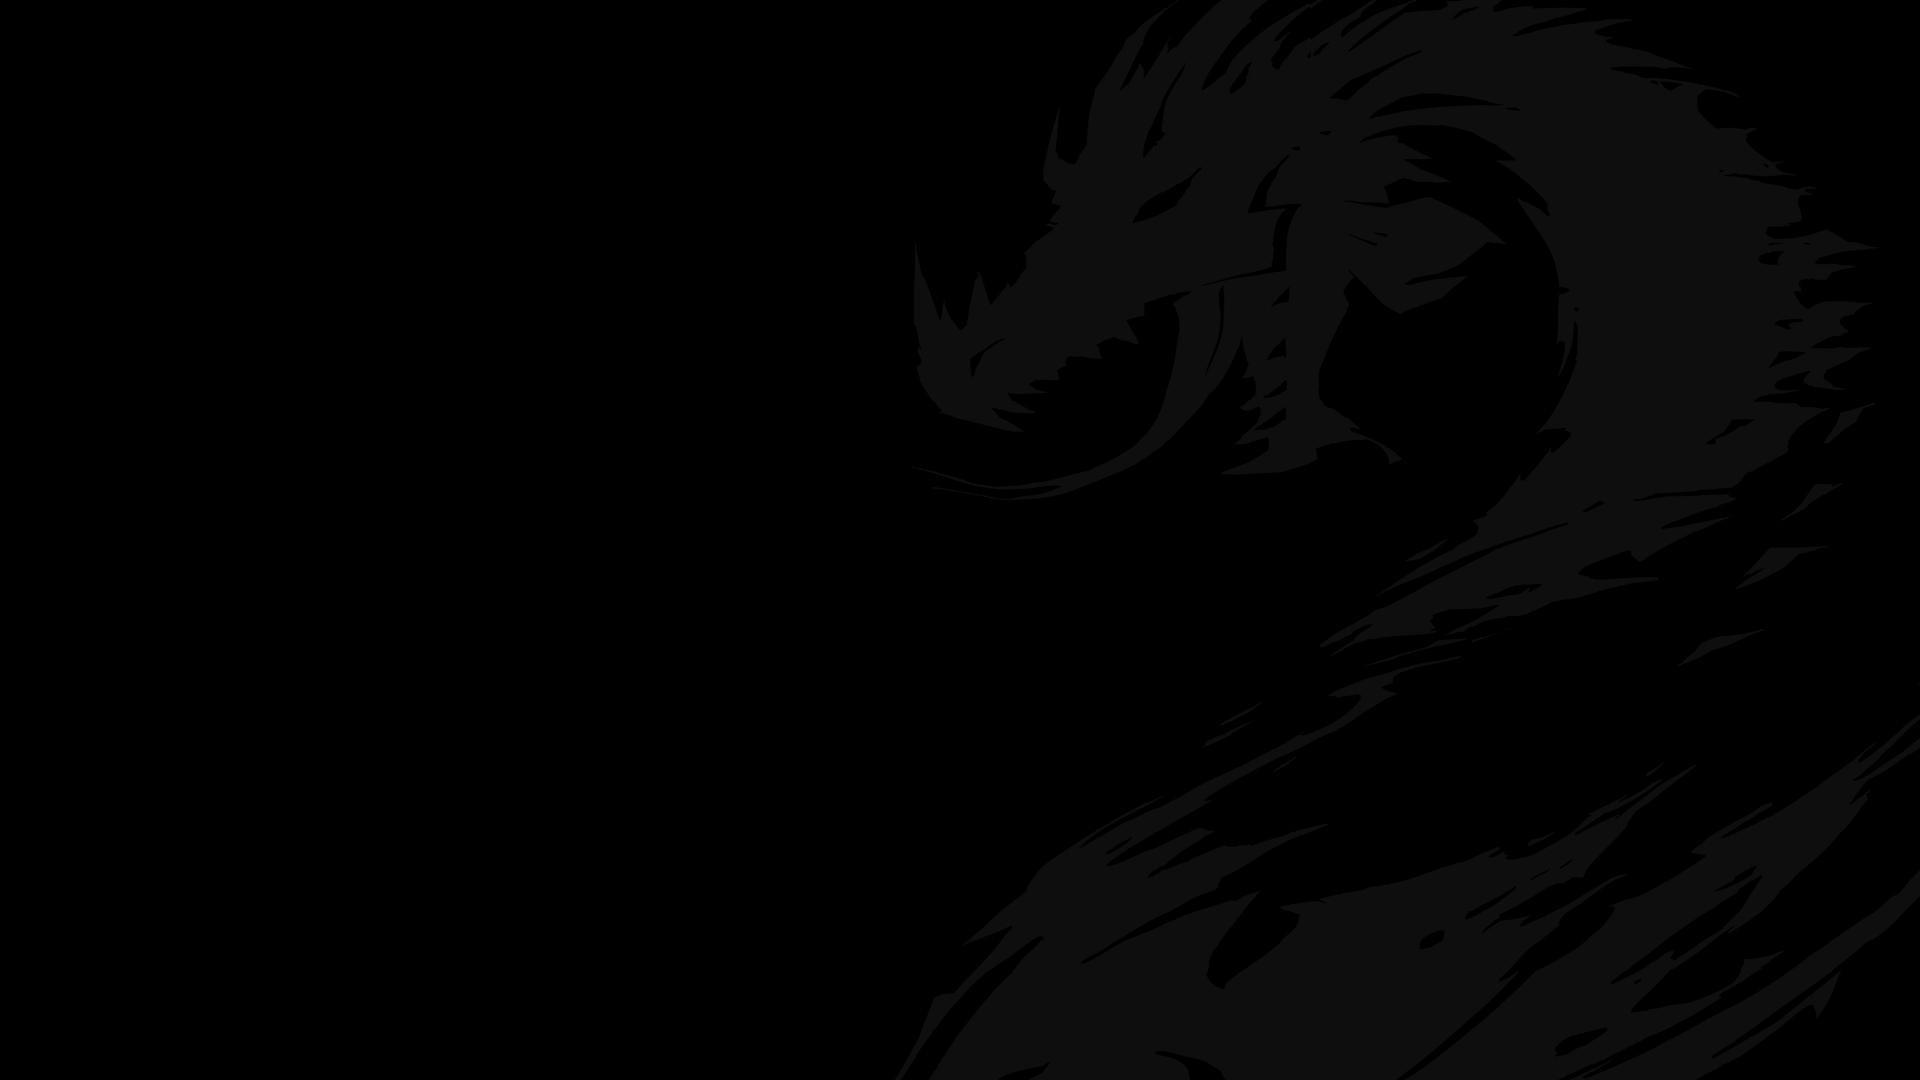 9. pure black wallpaper9